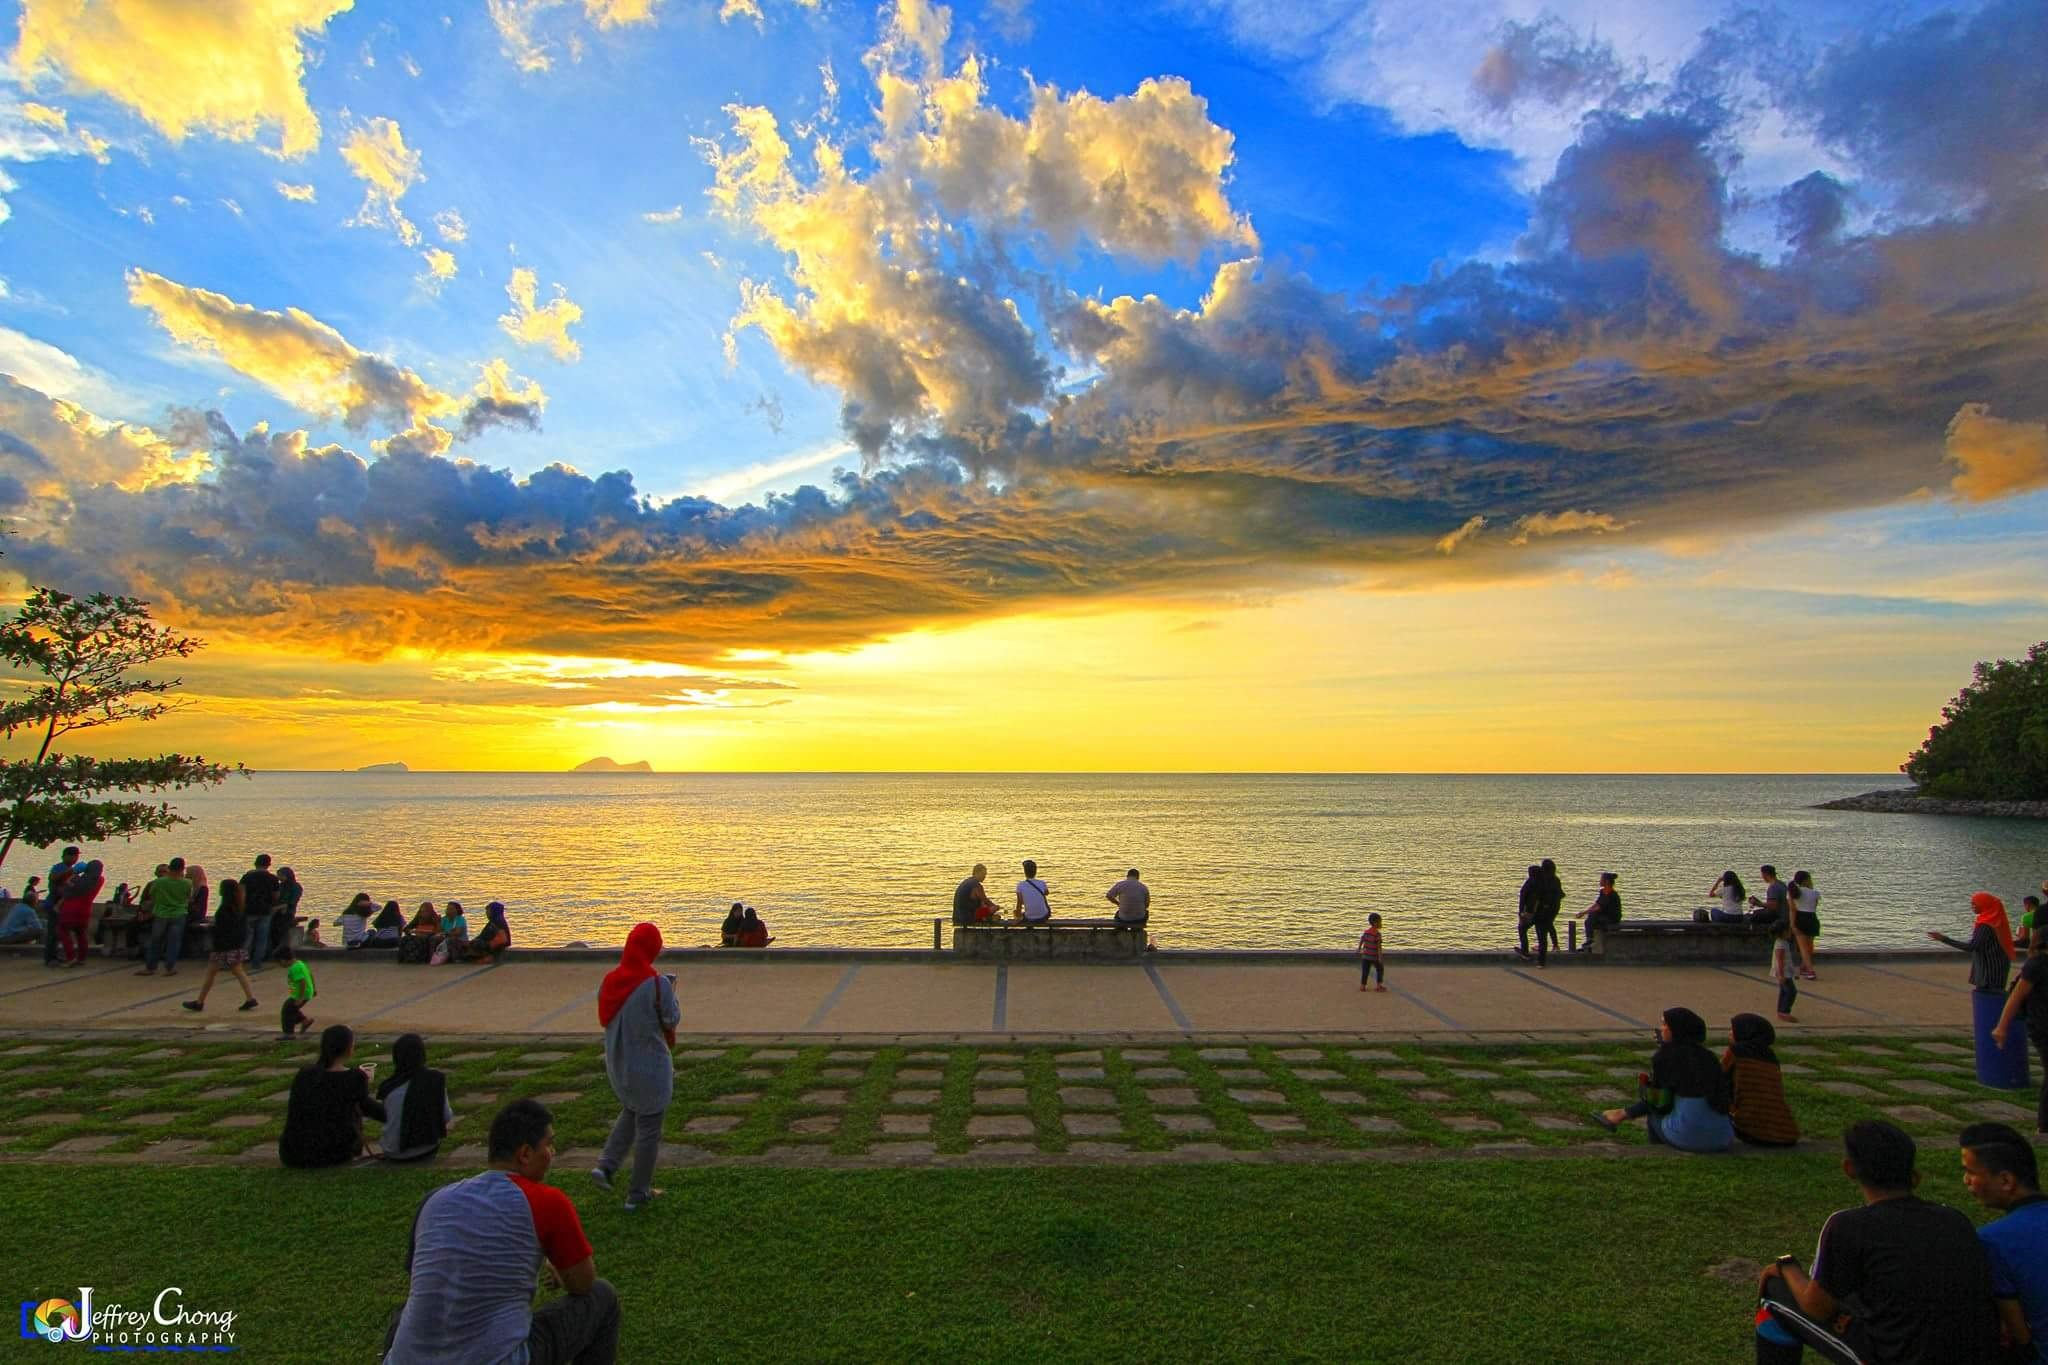 sunset by Jeffrey